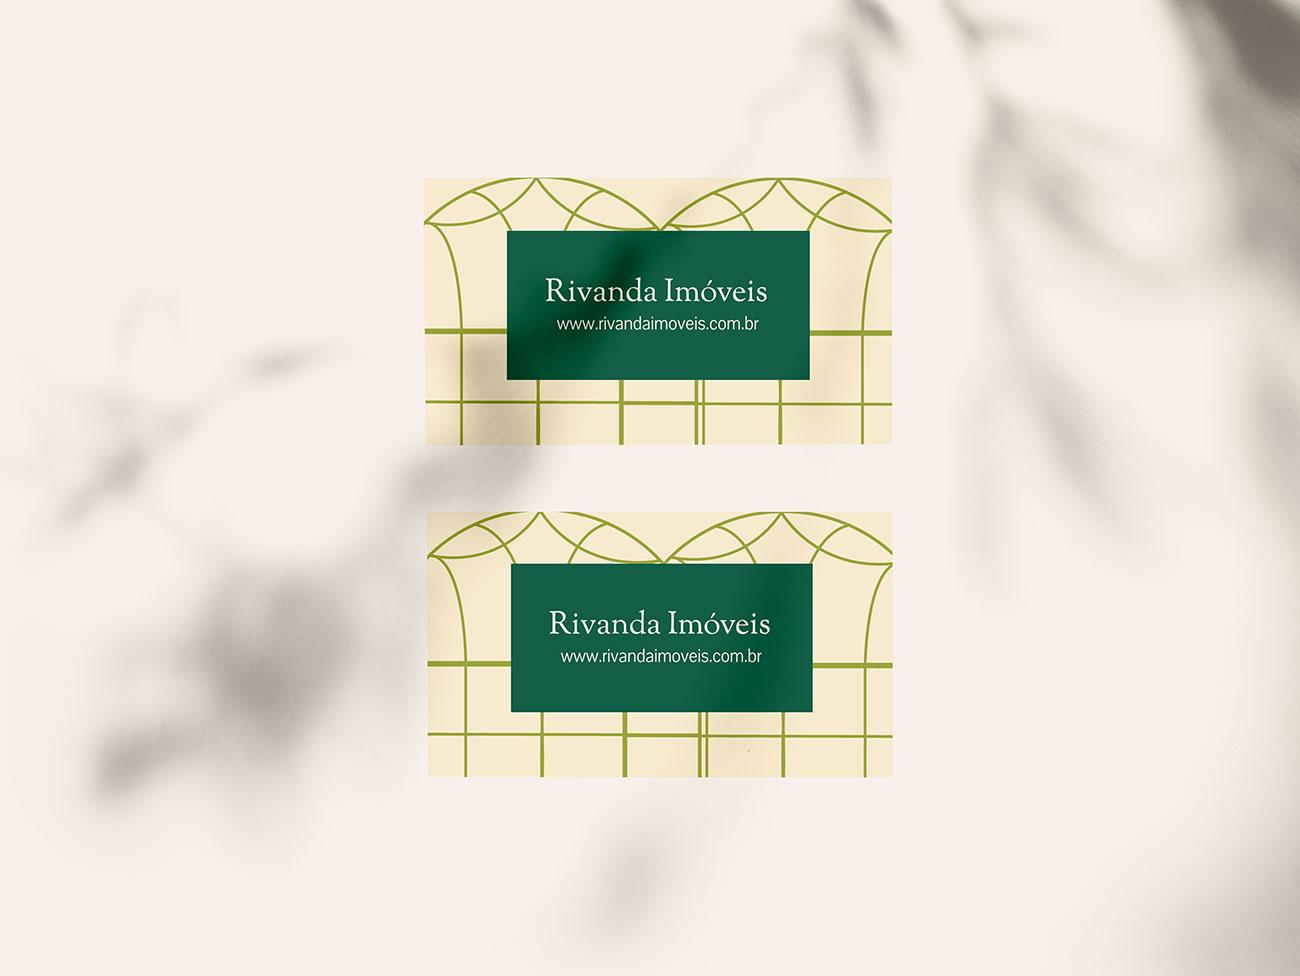 Rivanda Imóveis Logo Design